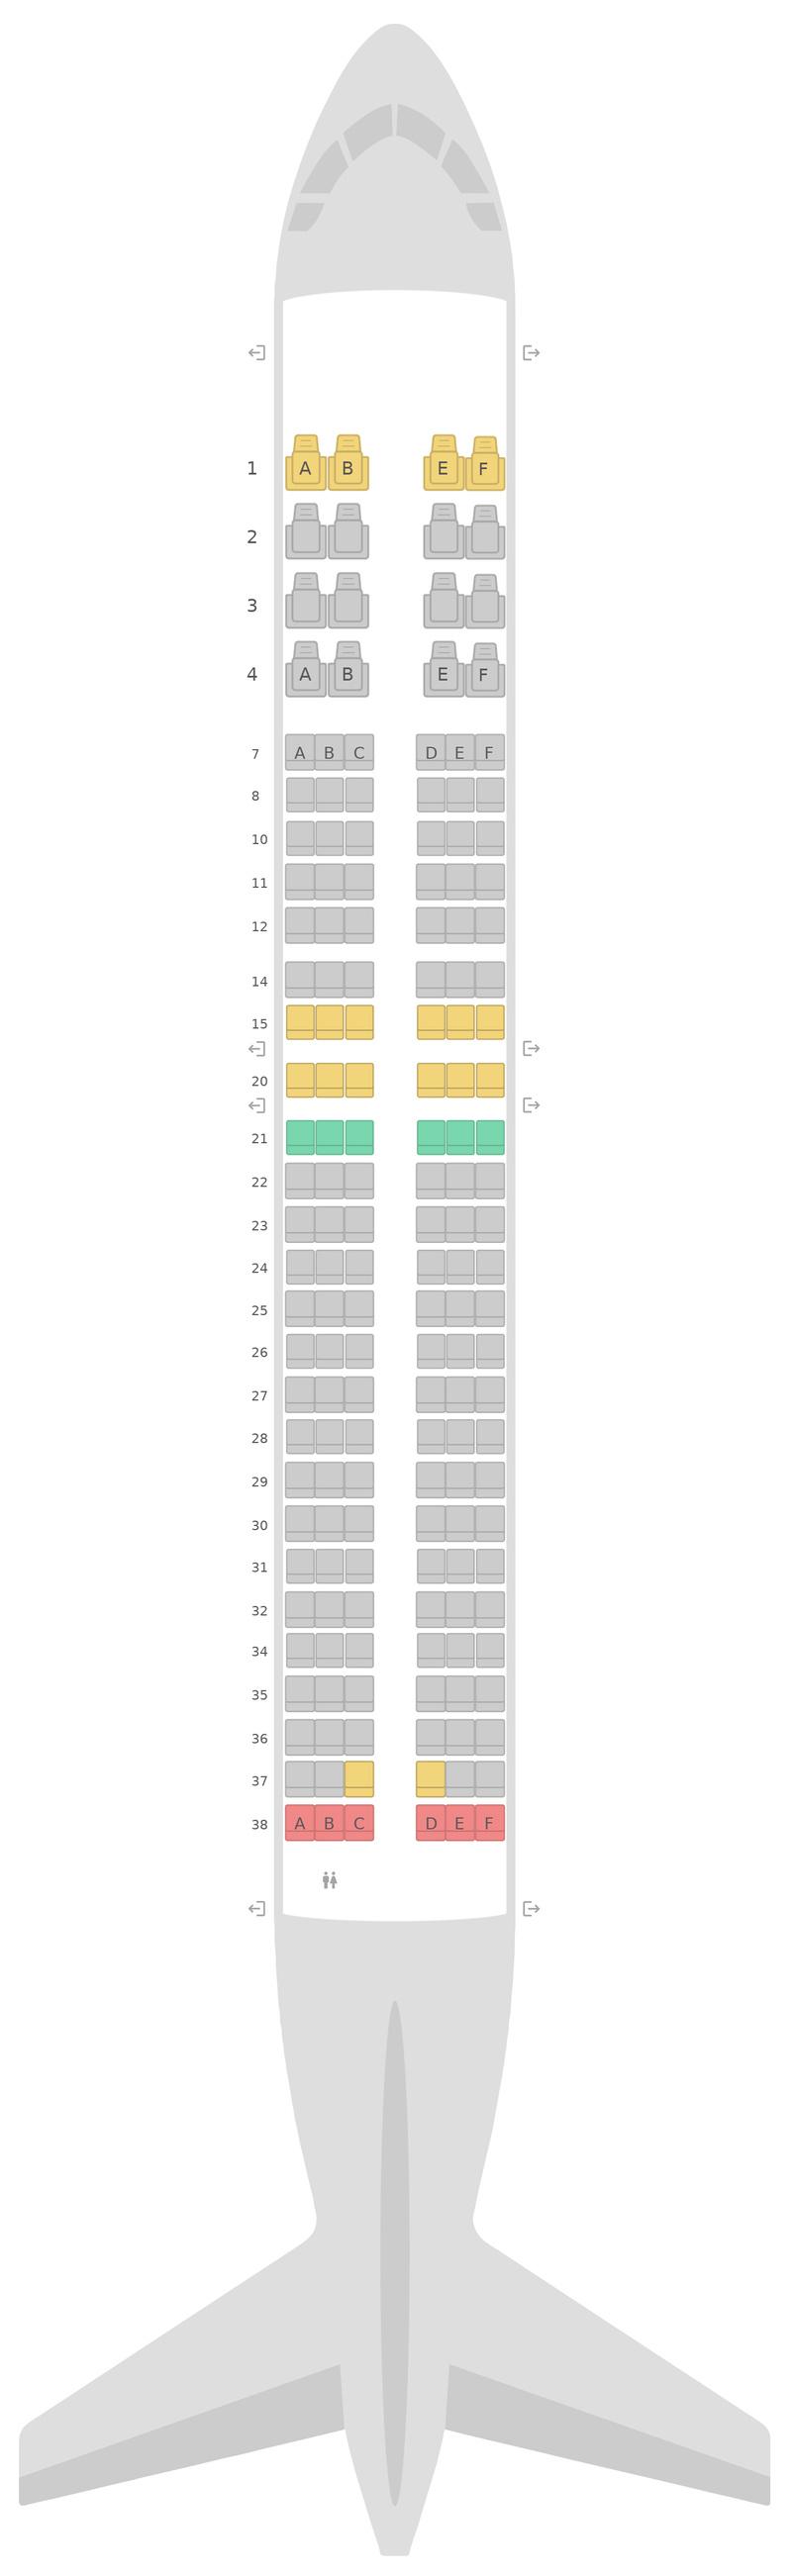 Seat Map United Boeing 737-800 (738) v3